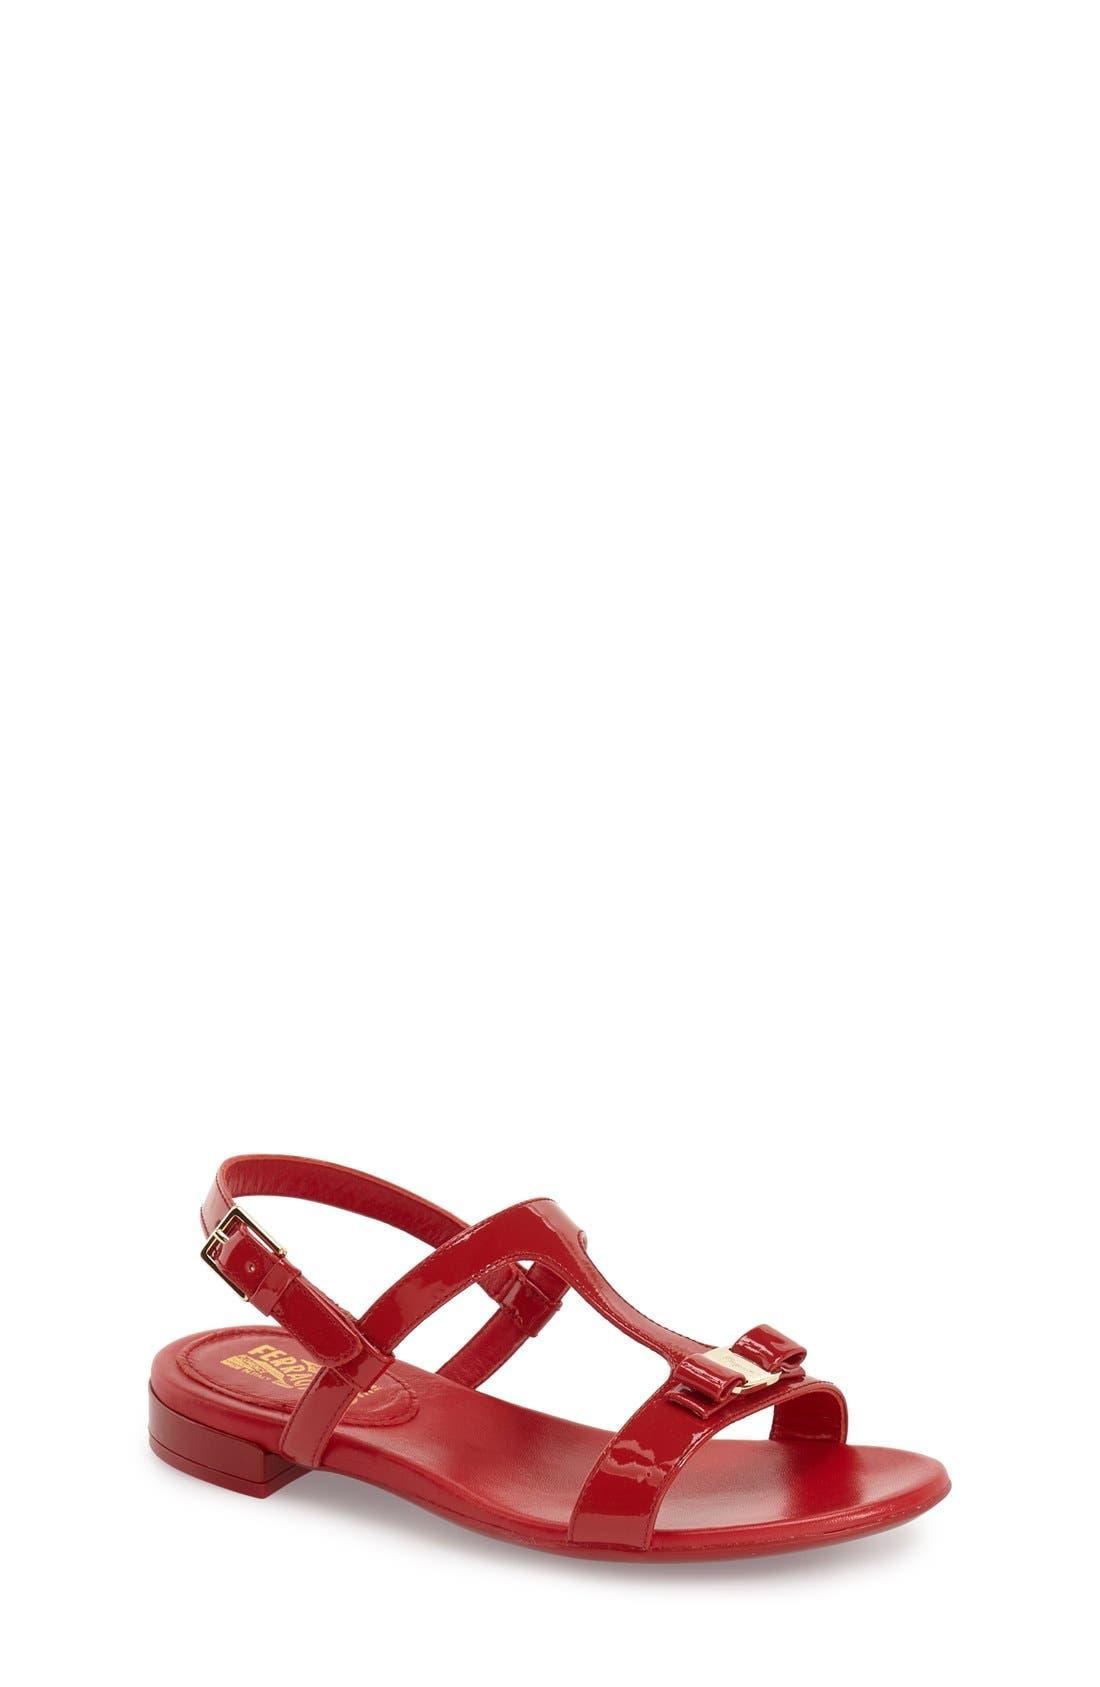 SALVATORE FERRAGAMO 'Ariel 2' Patent Leather T-Strap Sandal